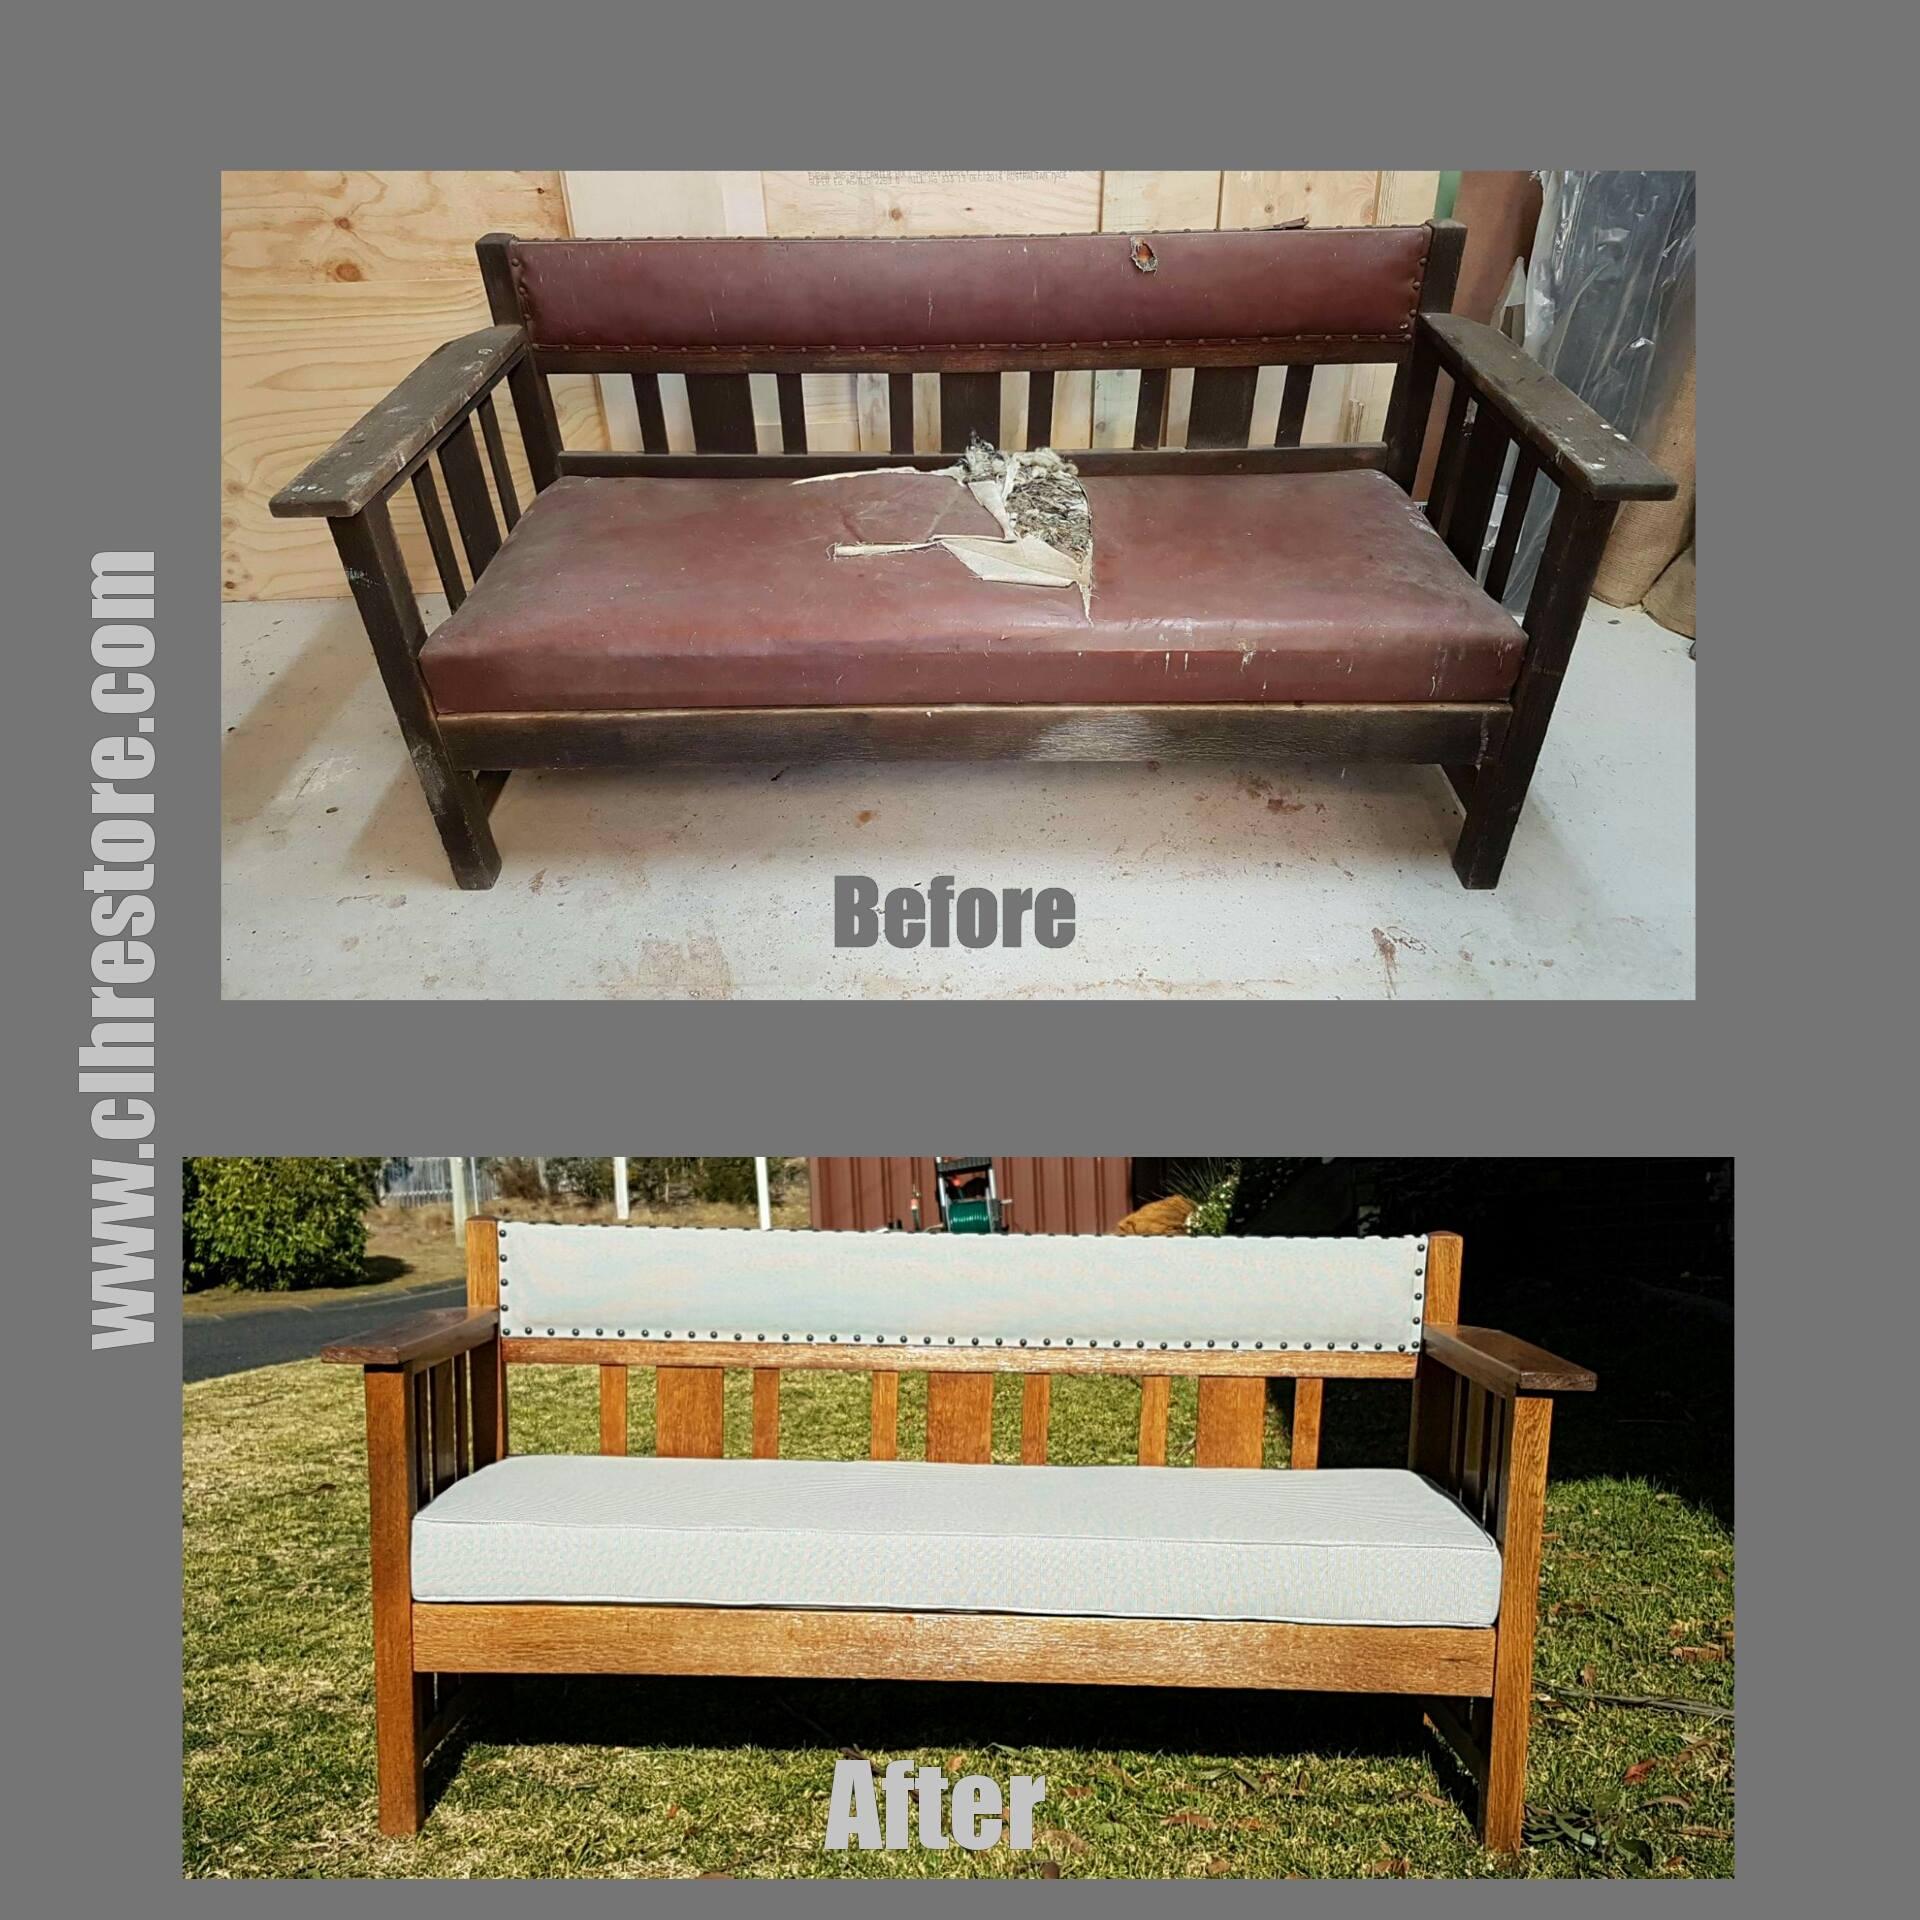 Outdoor seating restoration